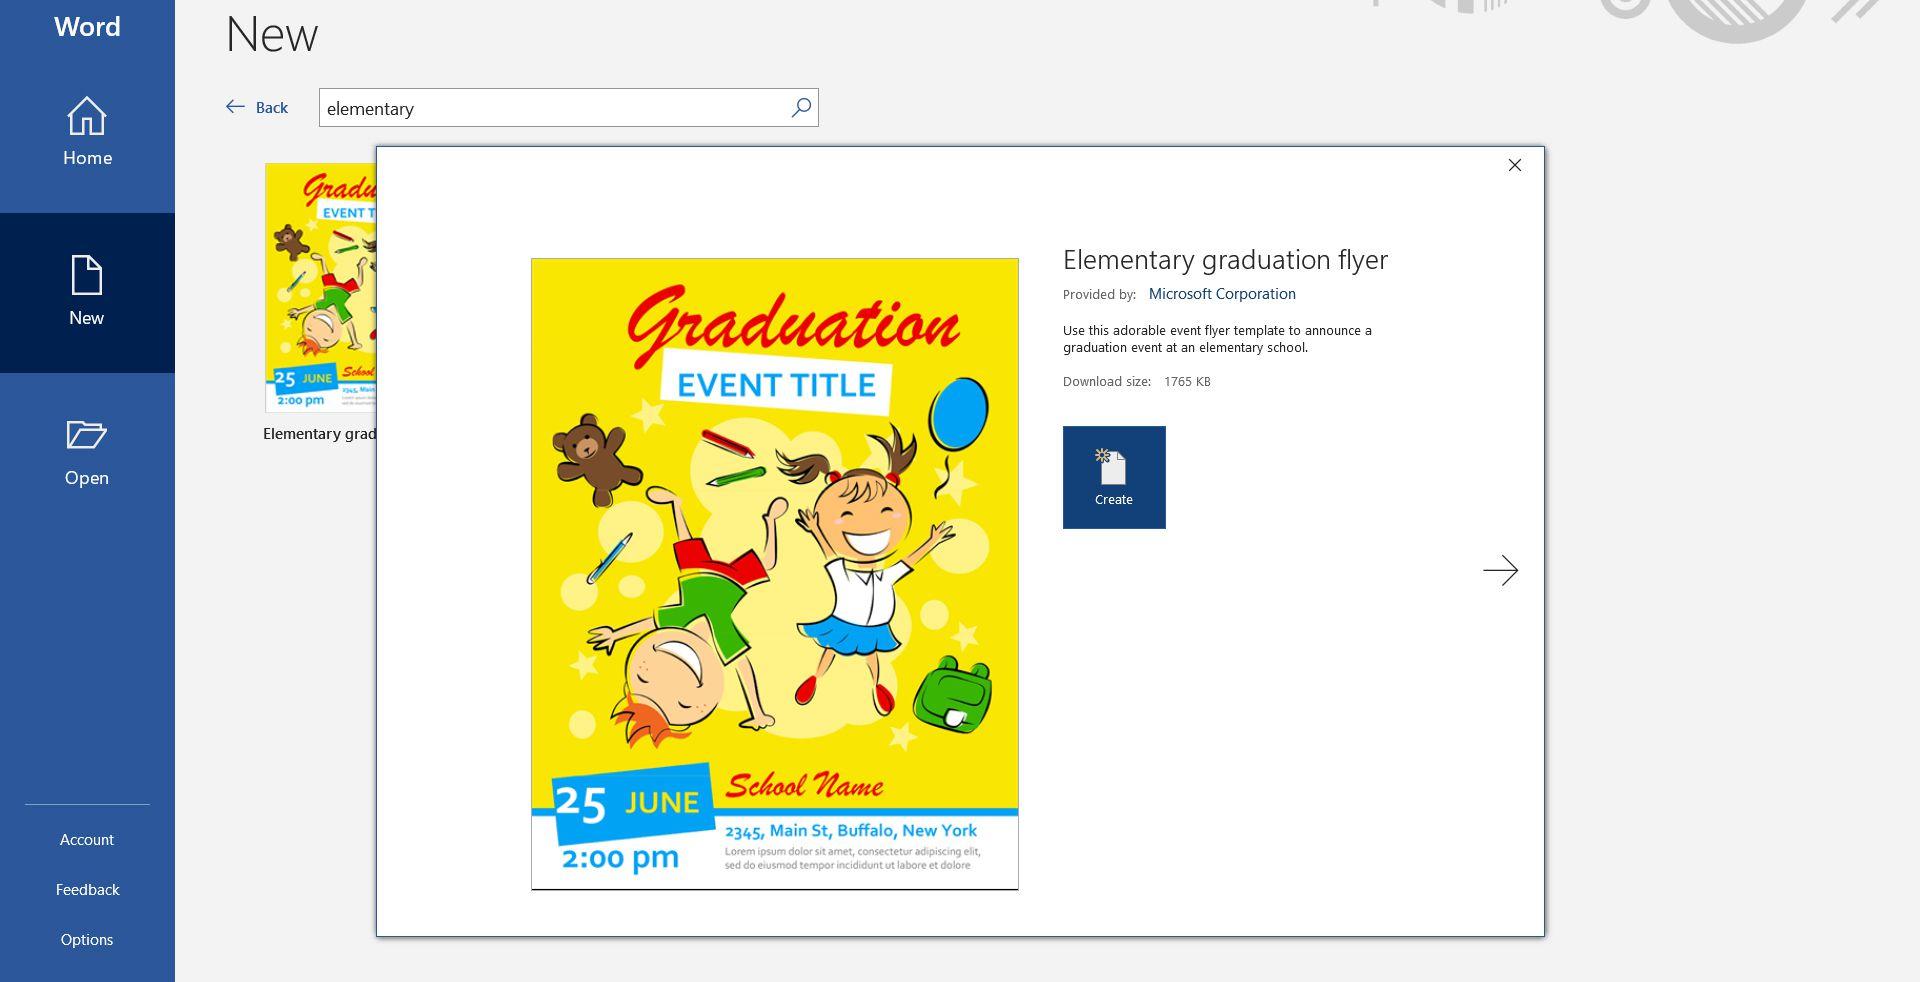 Microsoft Word flyer template for elementary school graduation